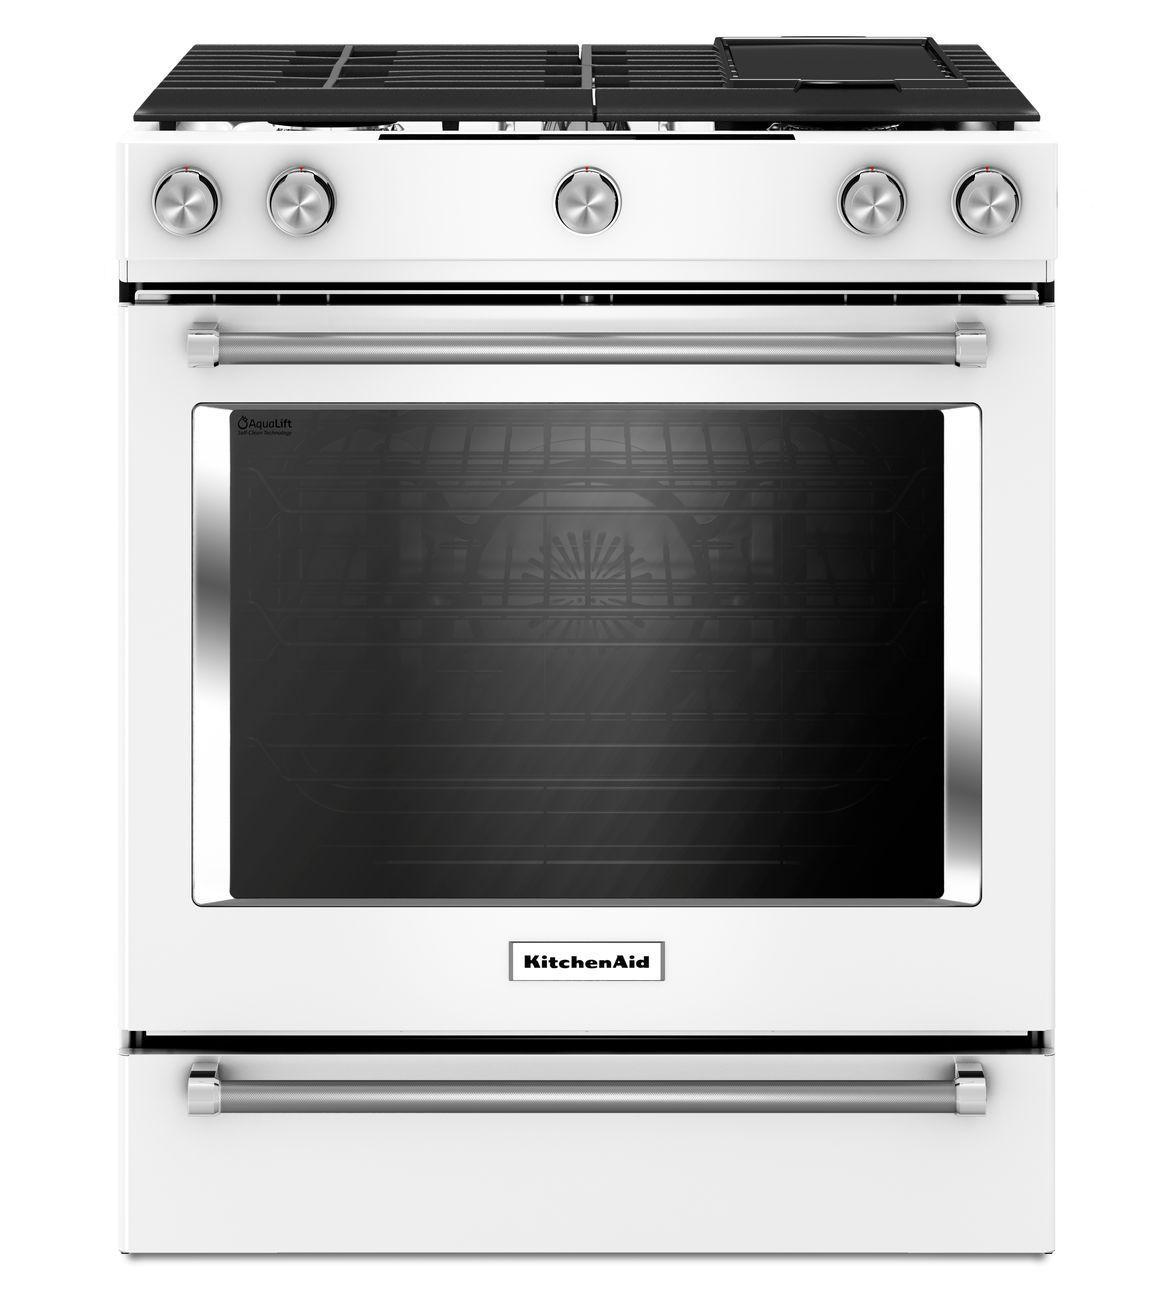 kitchenaid 30 inch 4 burner gas cooktop